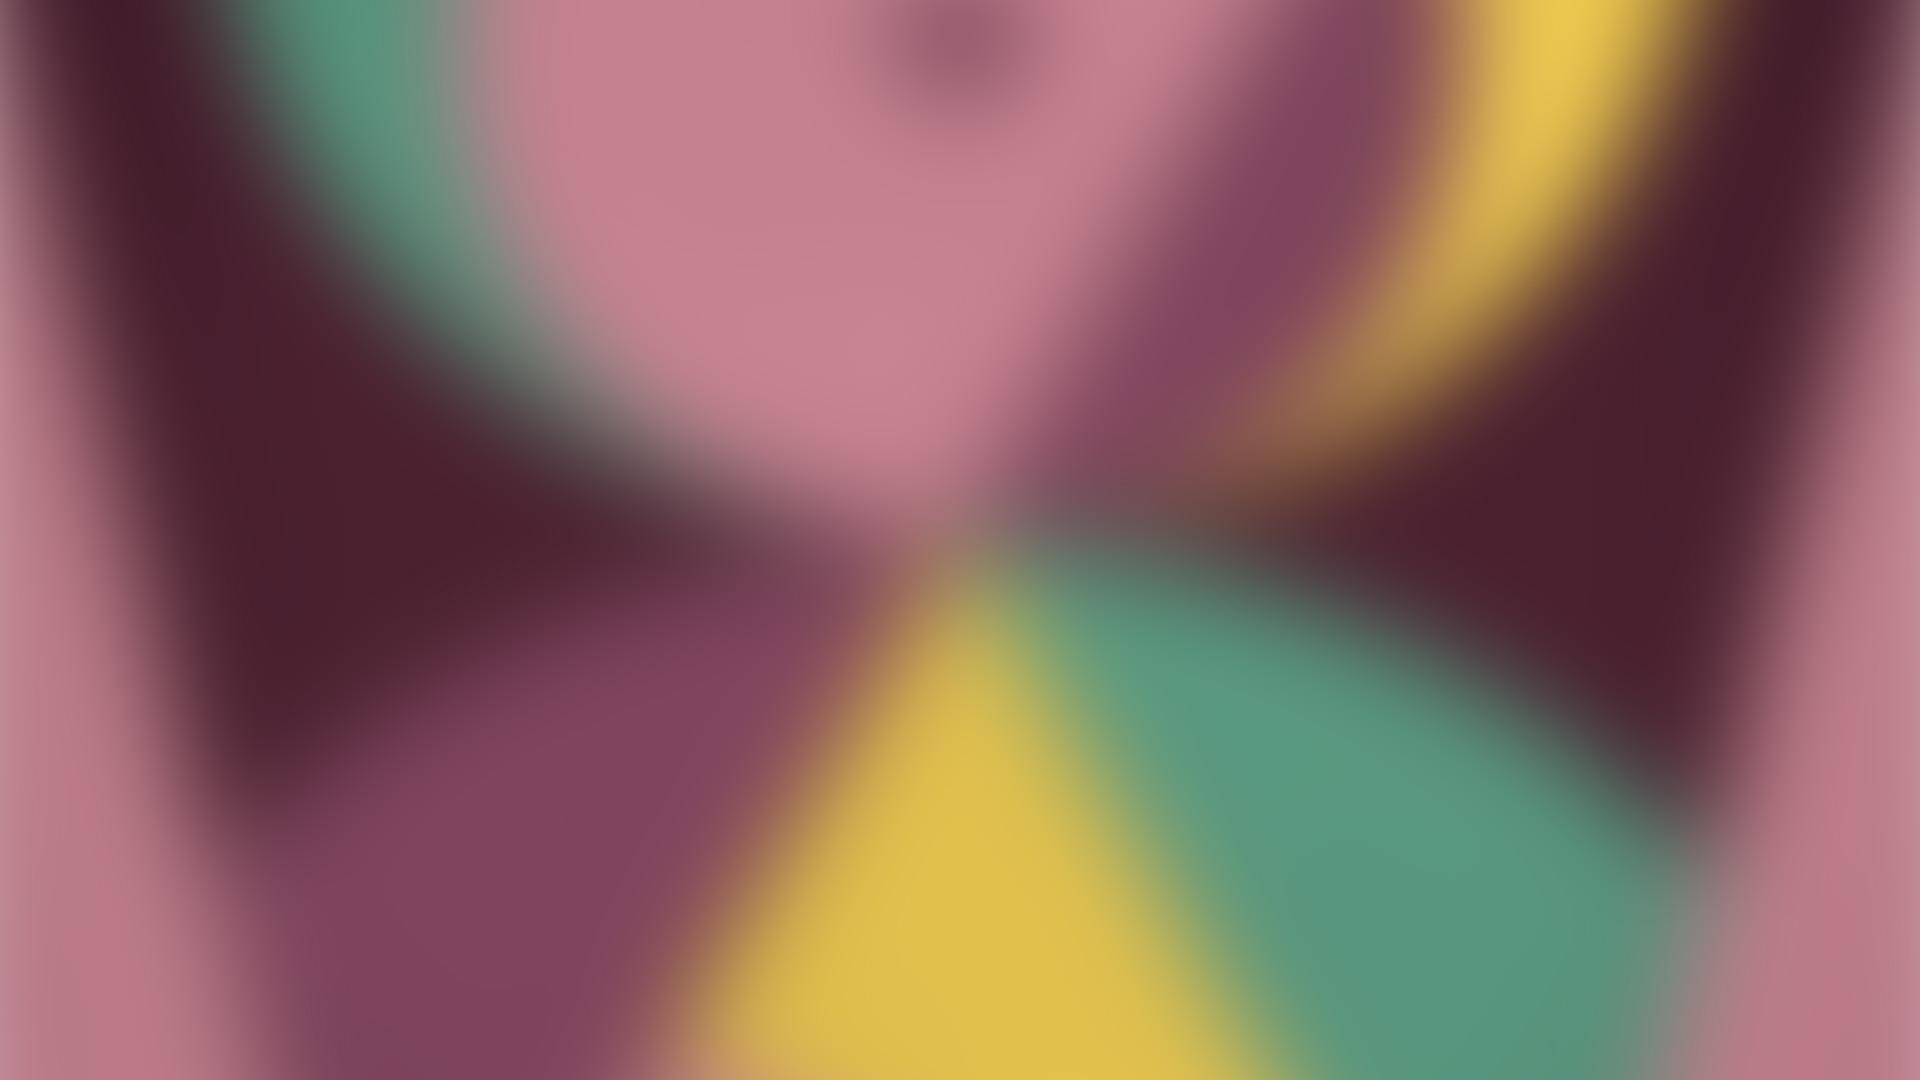 CBCBL008_Hiorrana_WaitingTo_bg-blur